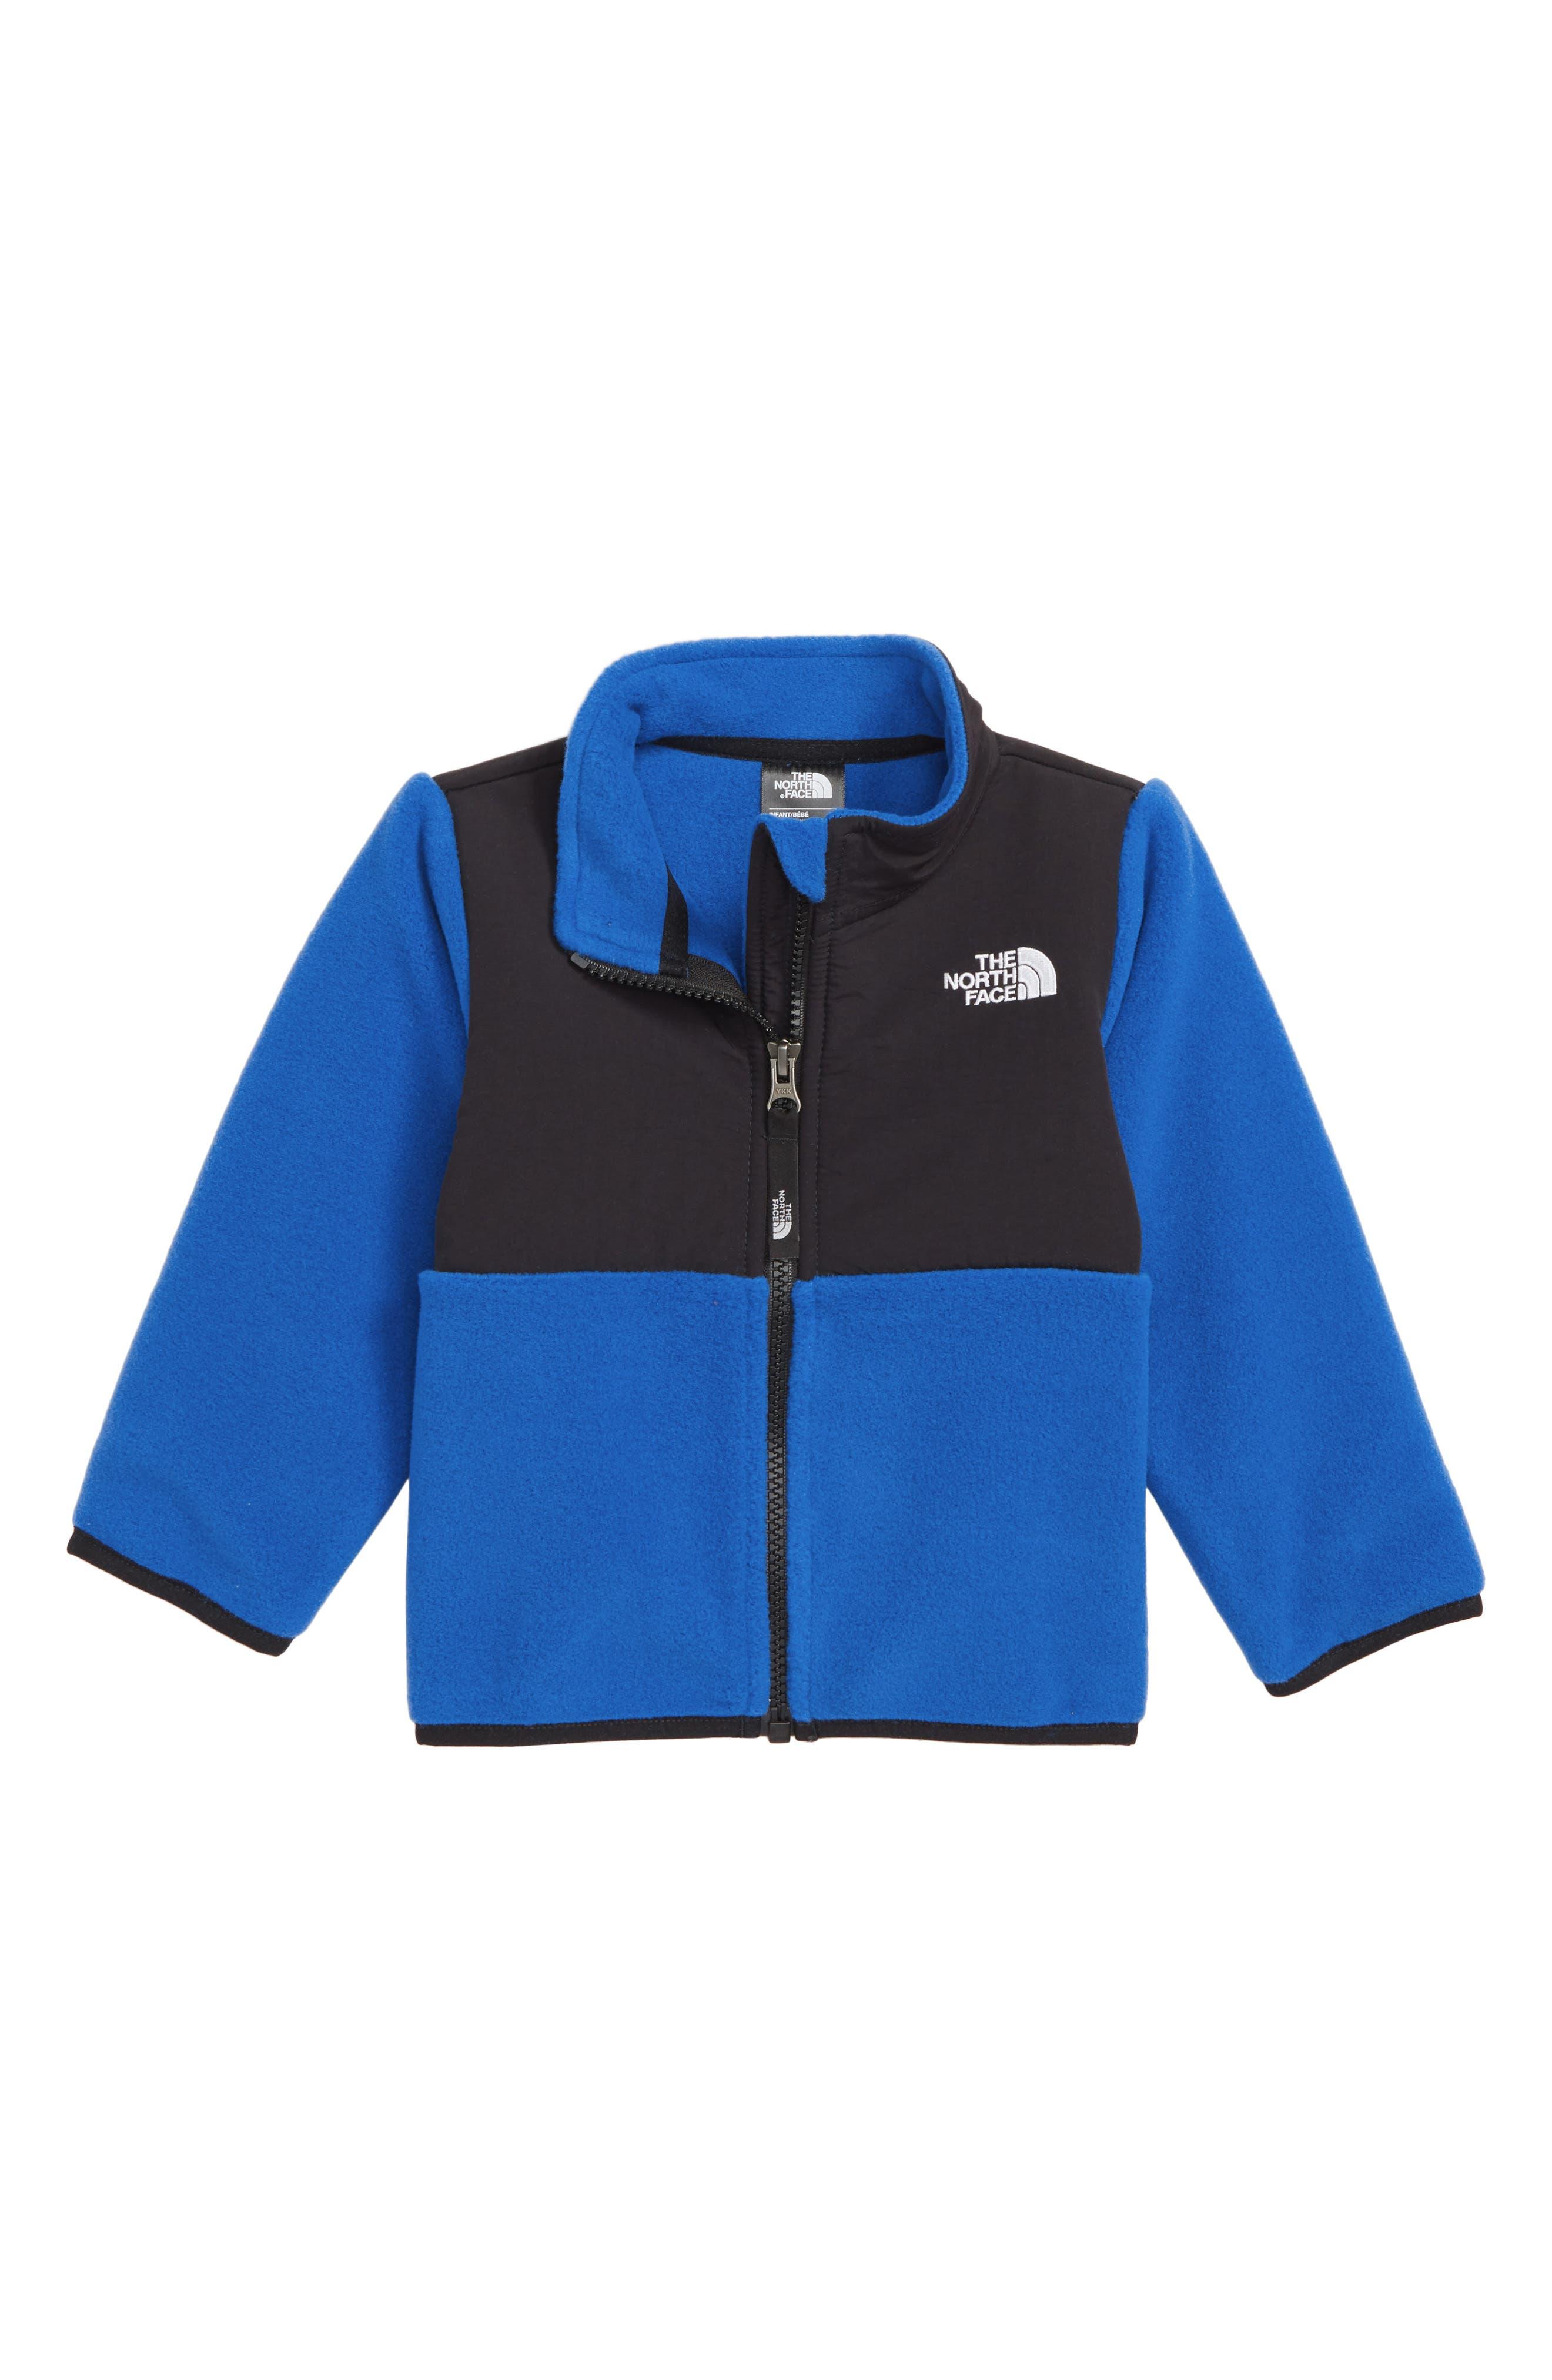 Denali Recycled Fleece Jacket,                             Main thumbnail 1, color,                             TURKISH SEA